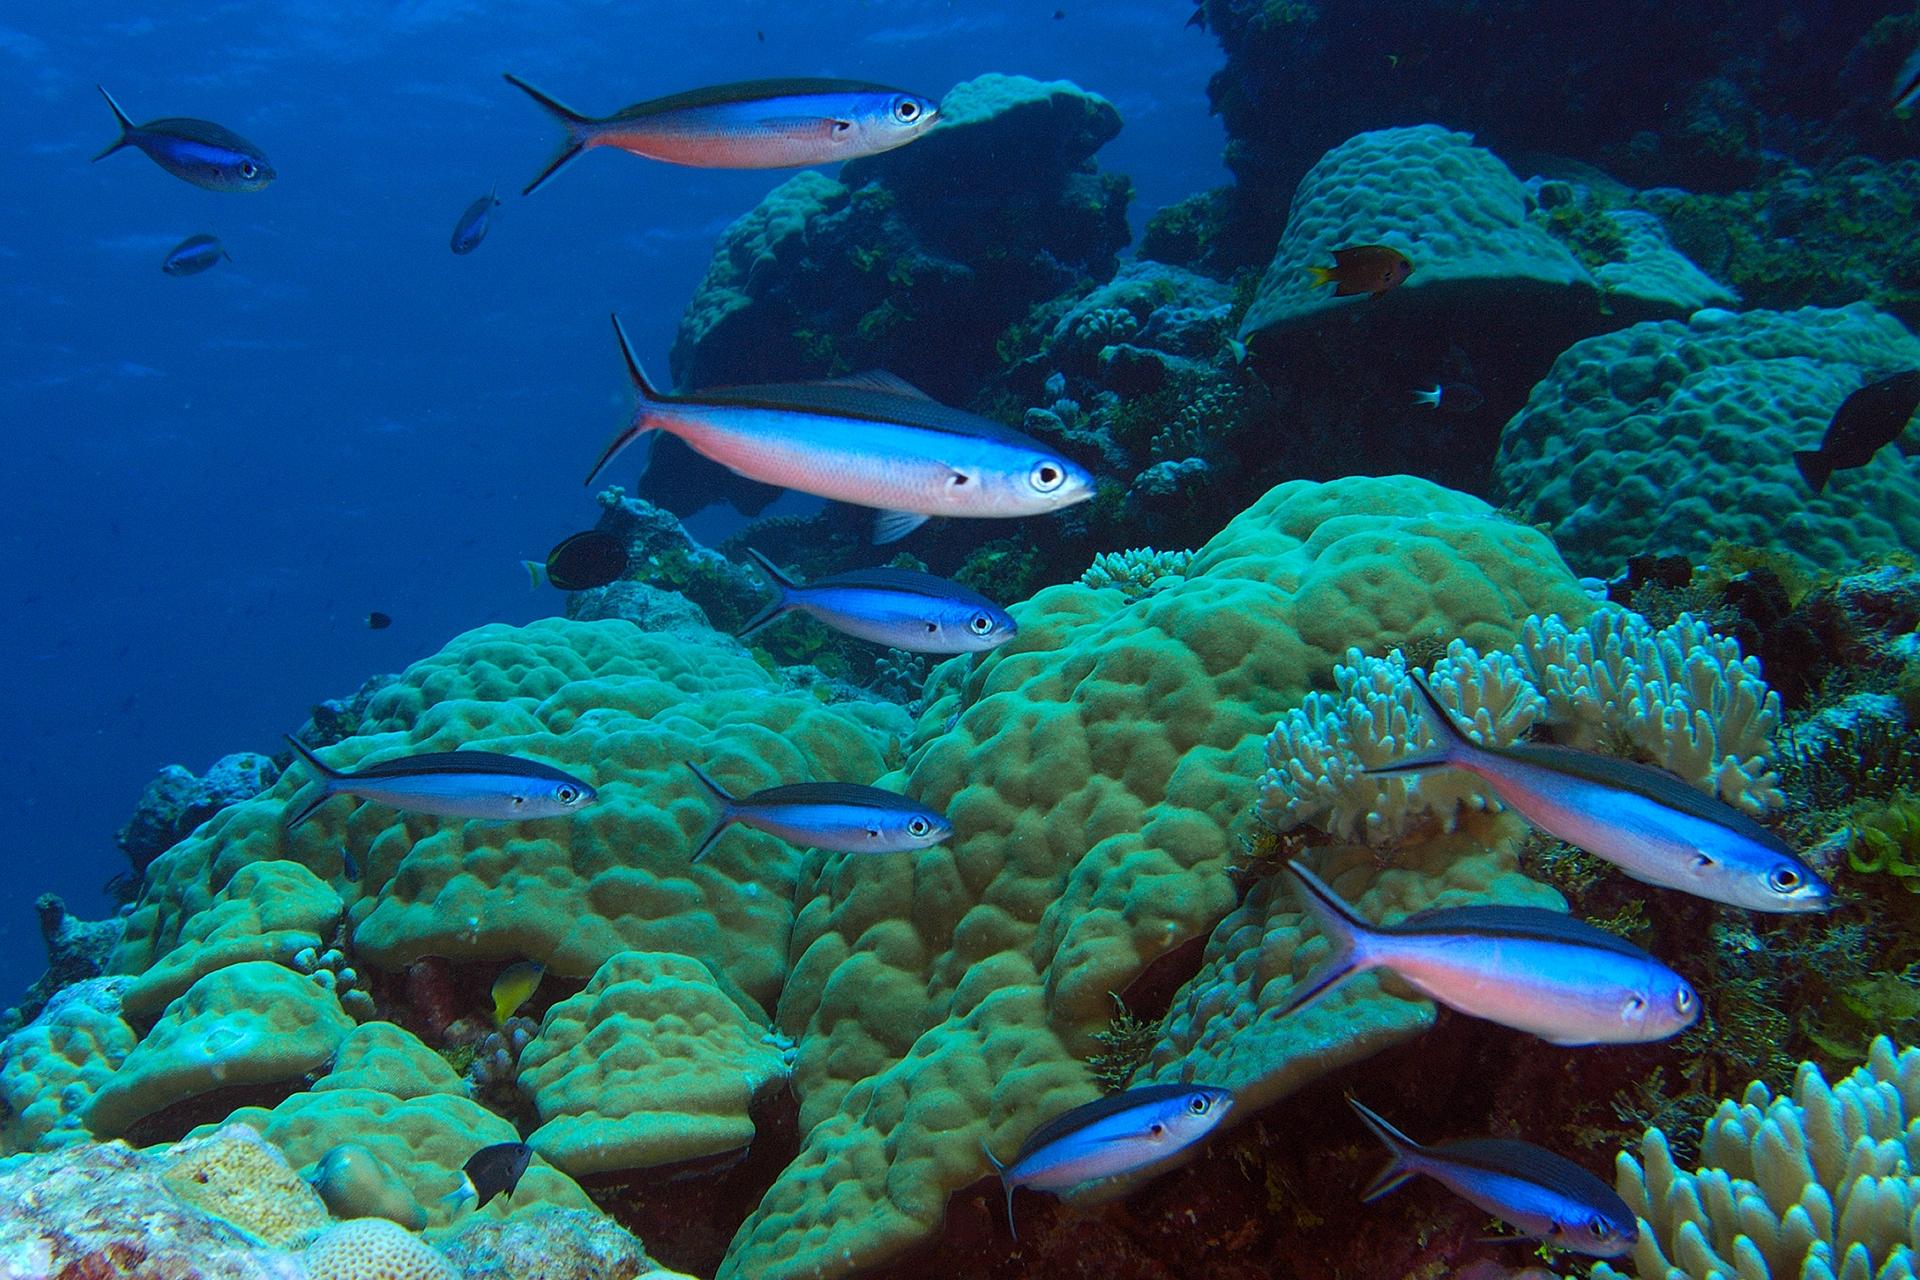 multi-image composition School of fish